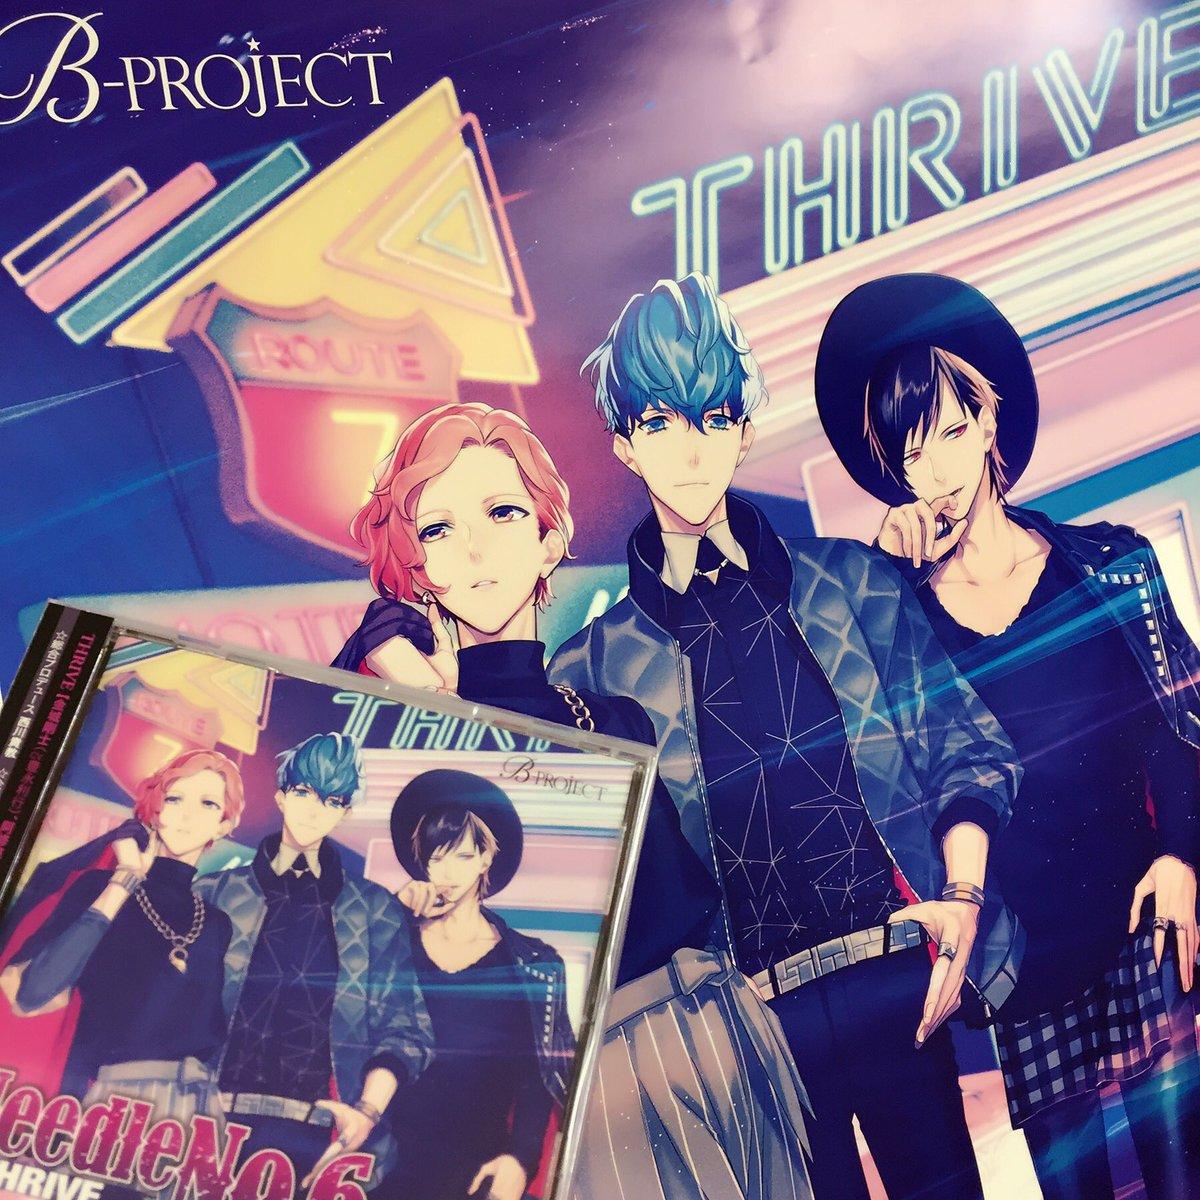 【MUSIC】本日2/22(水)発売!THRIVE NEW SINGLE『Needle No.6』  #Bプロ